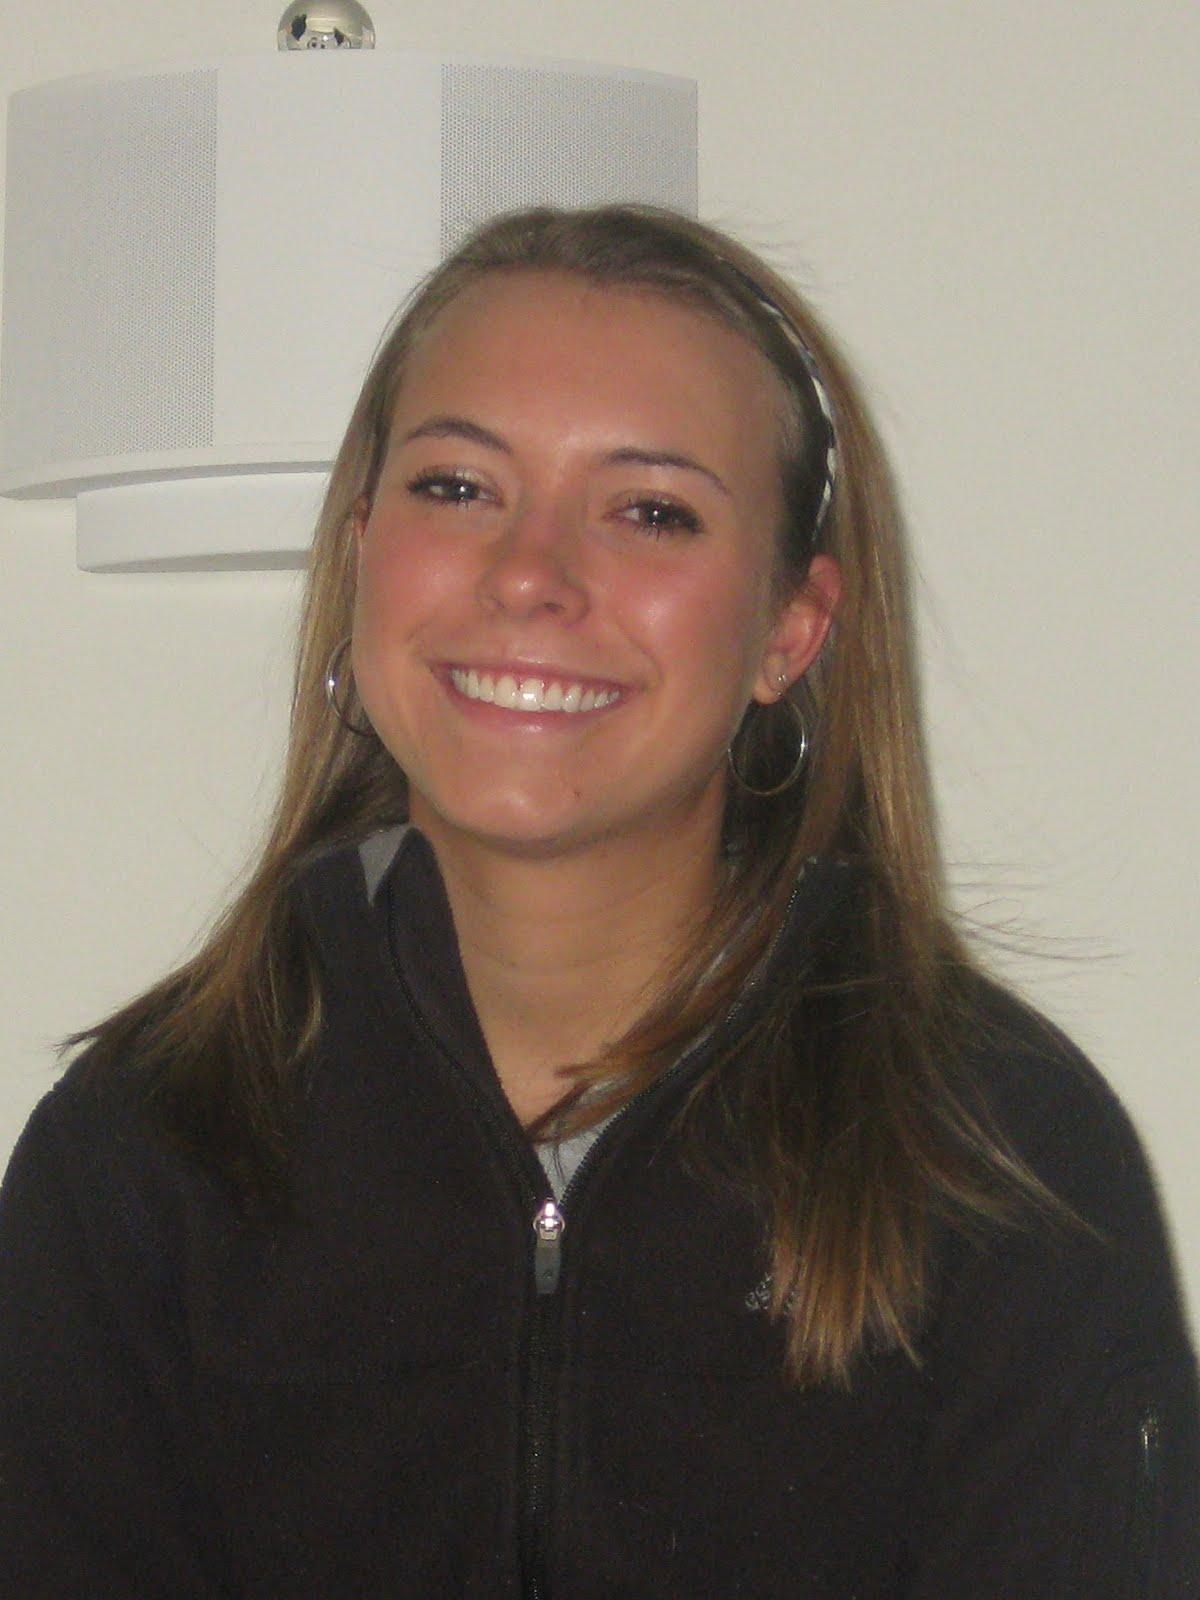 Forum on this topic: Valerie Gearon, laura-wheelwright/